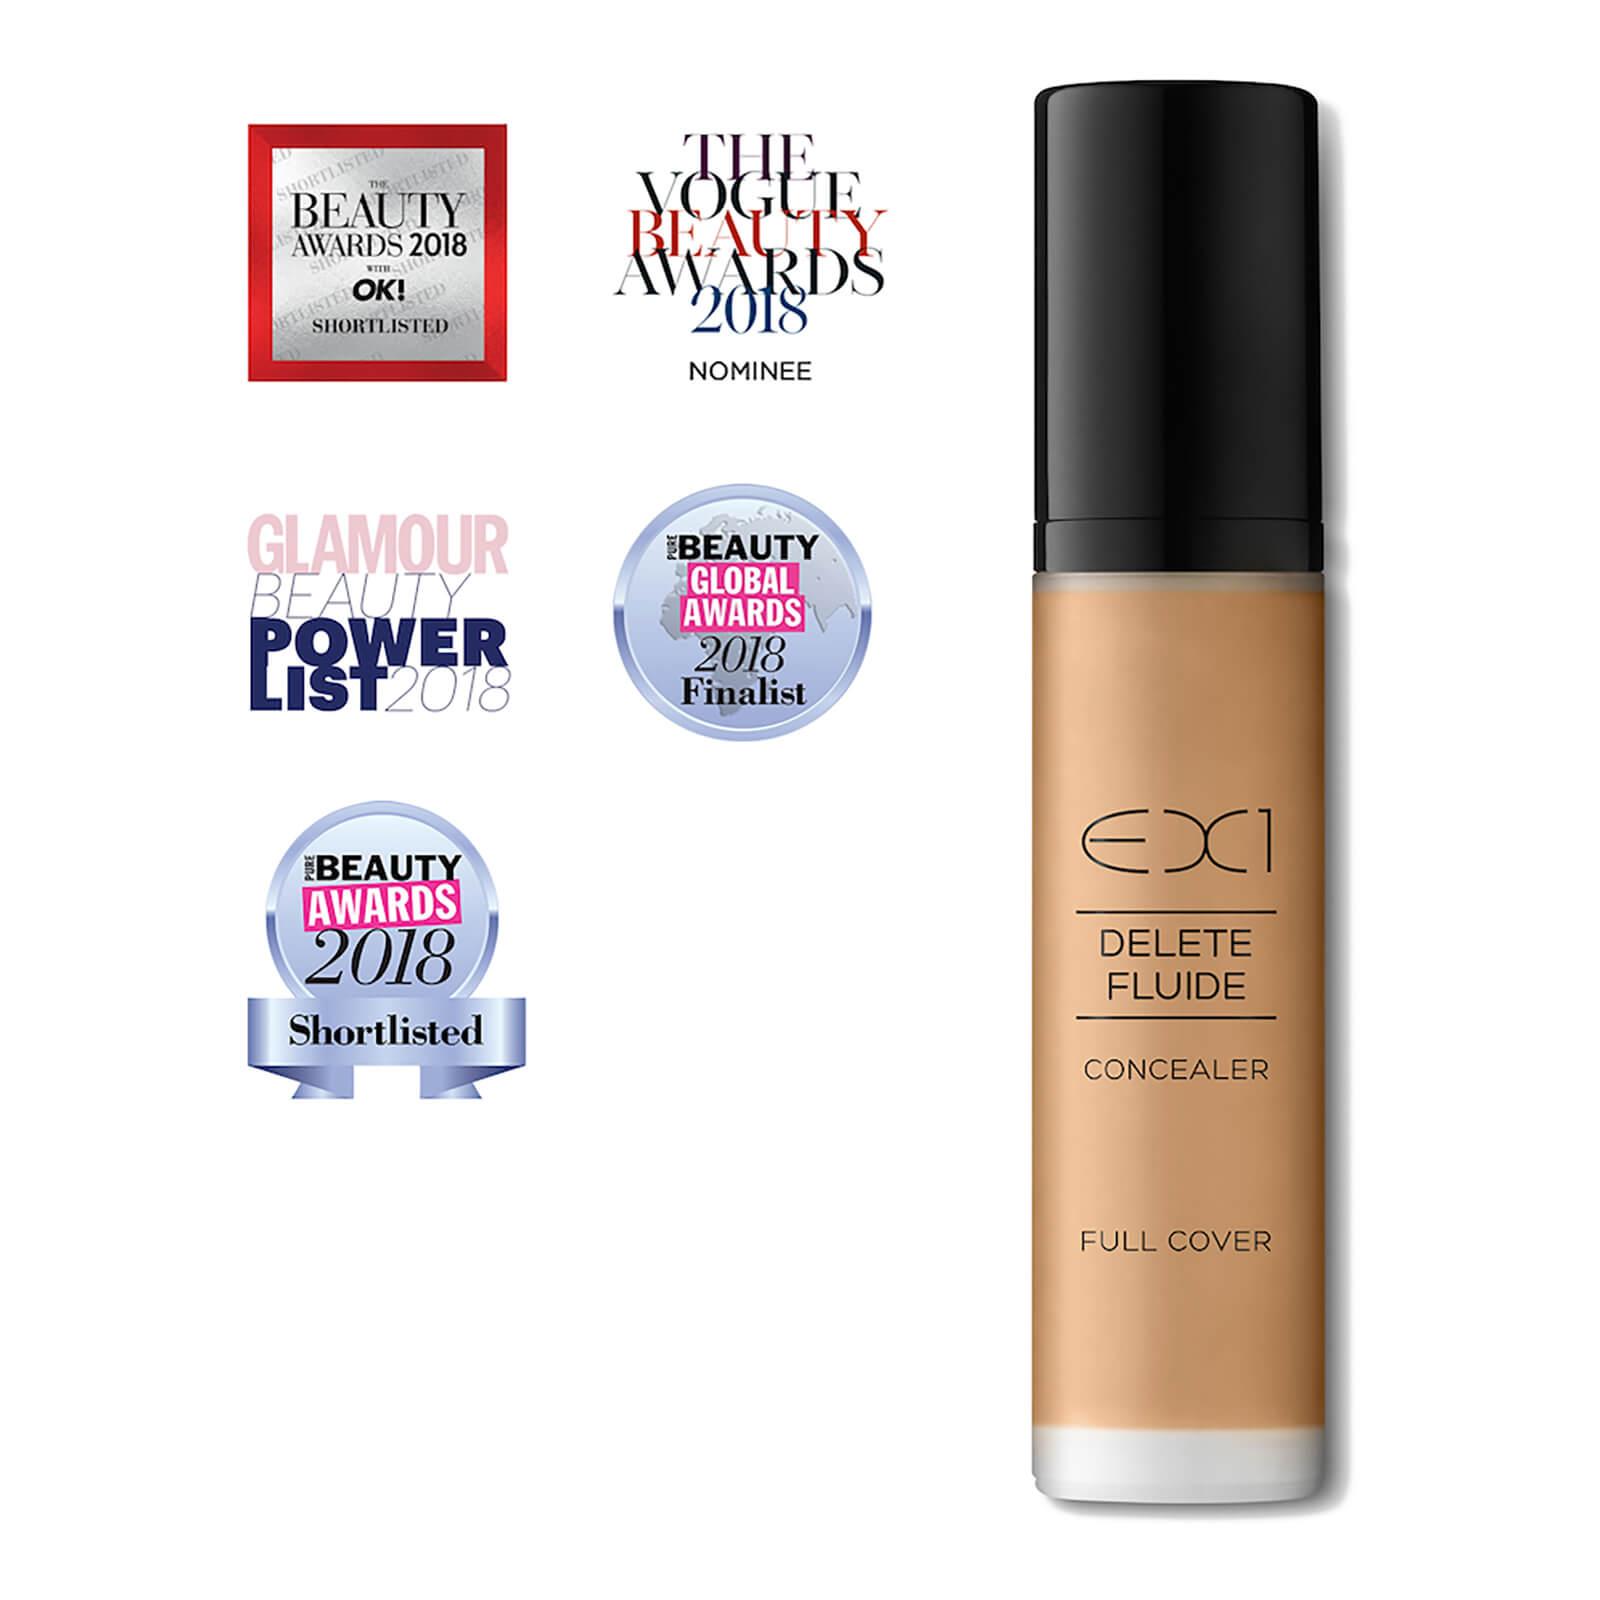 EX1 Cosmetics Delete Fluide Concealer (Various Shades) - 5.0